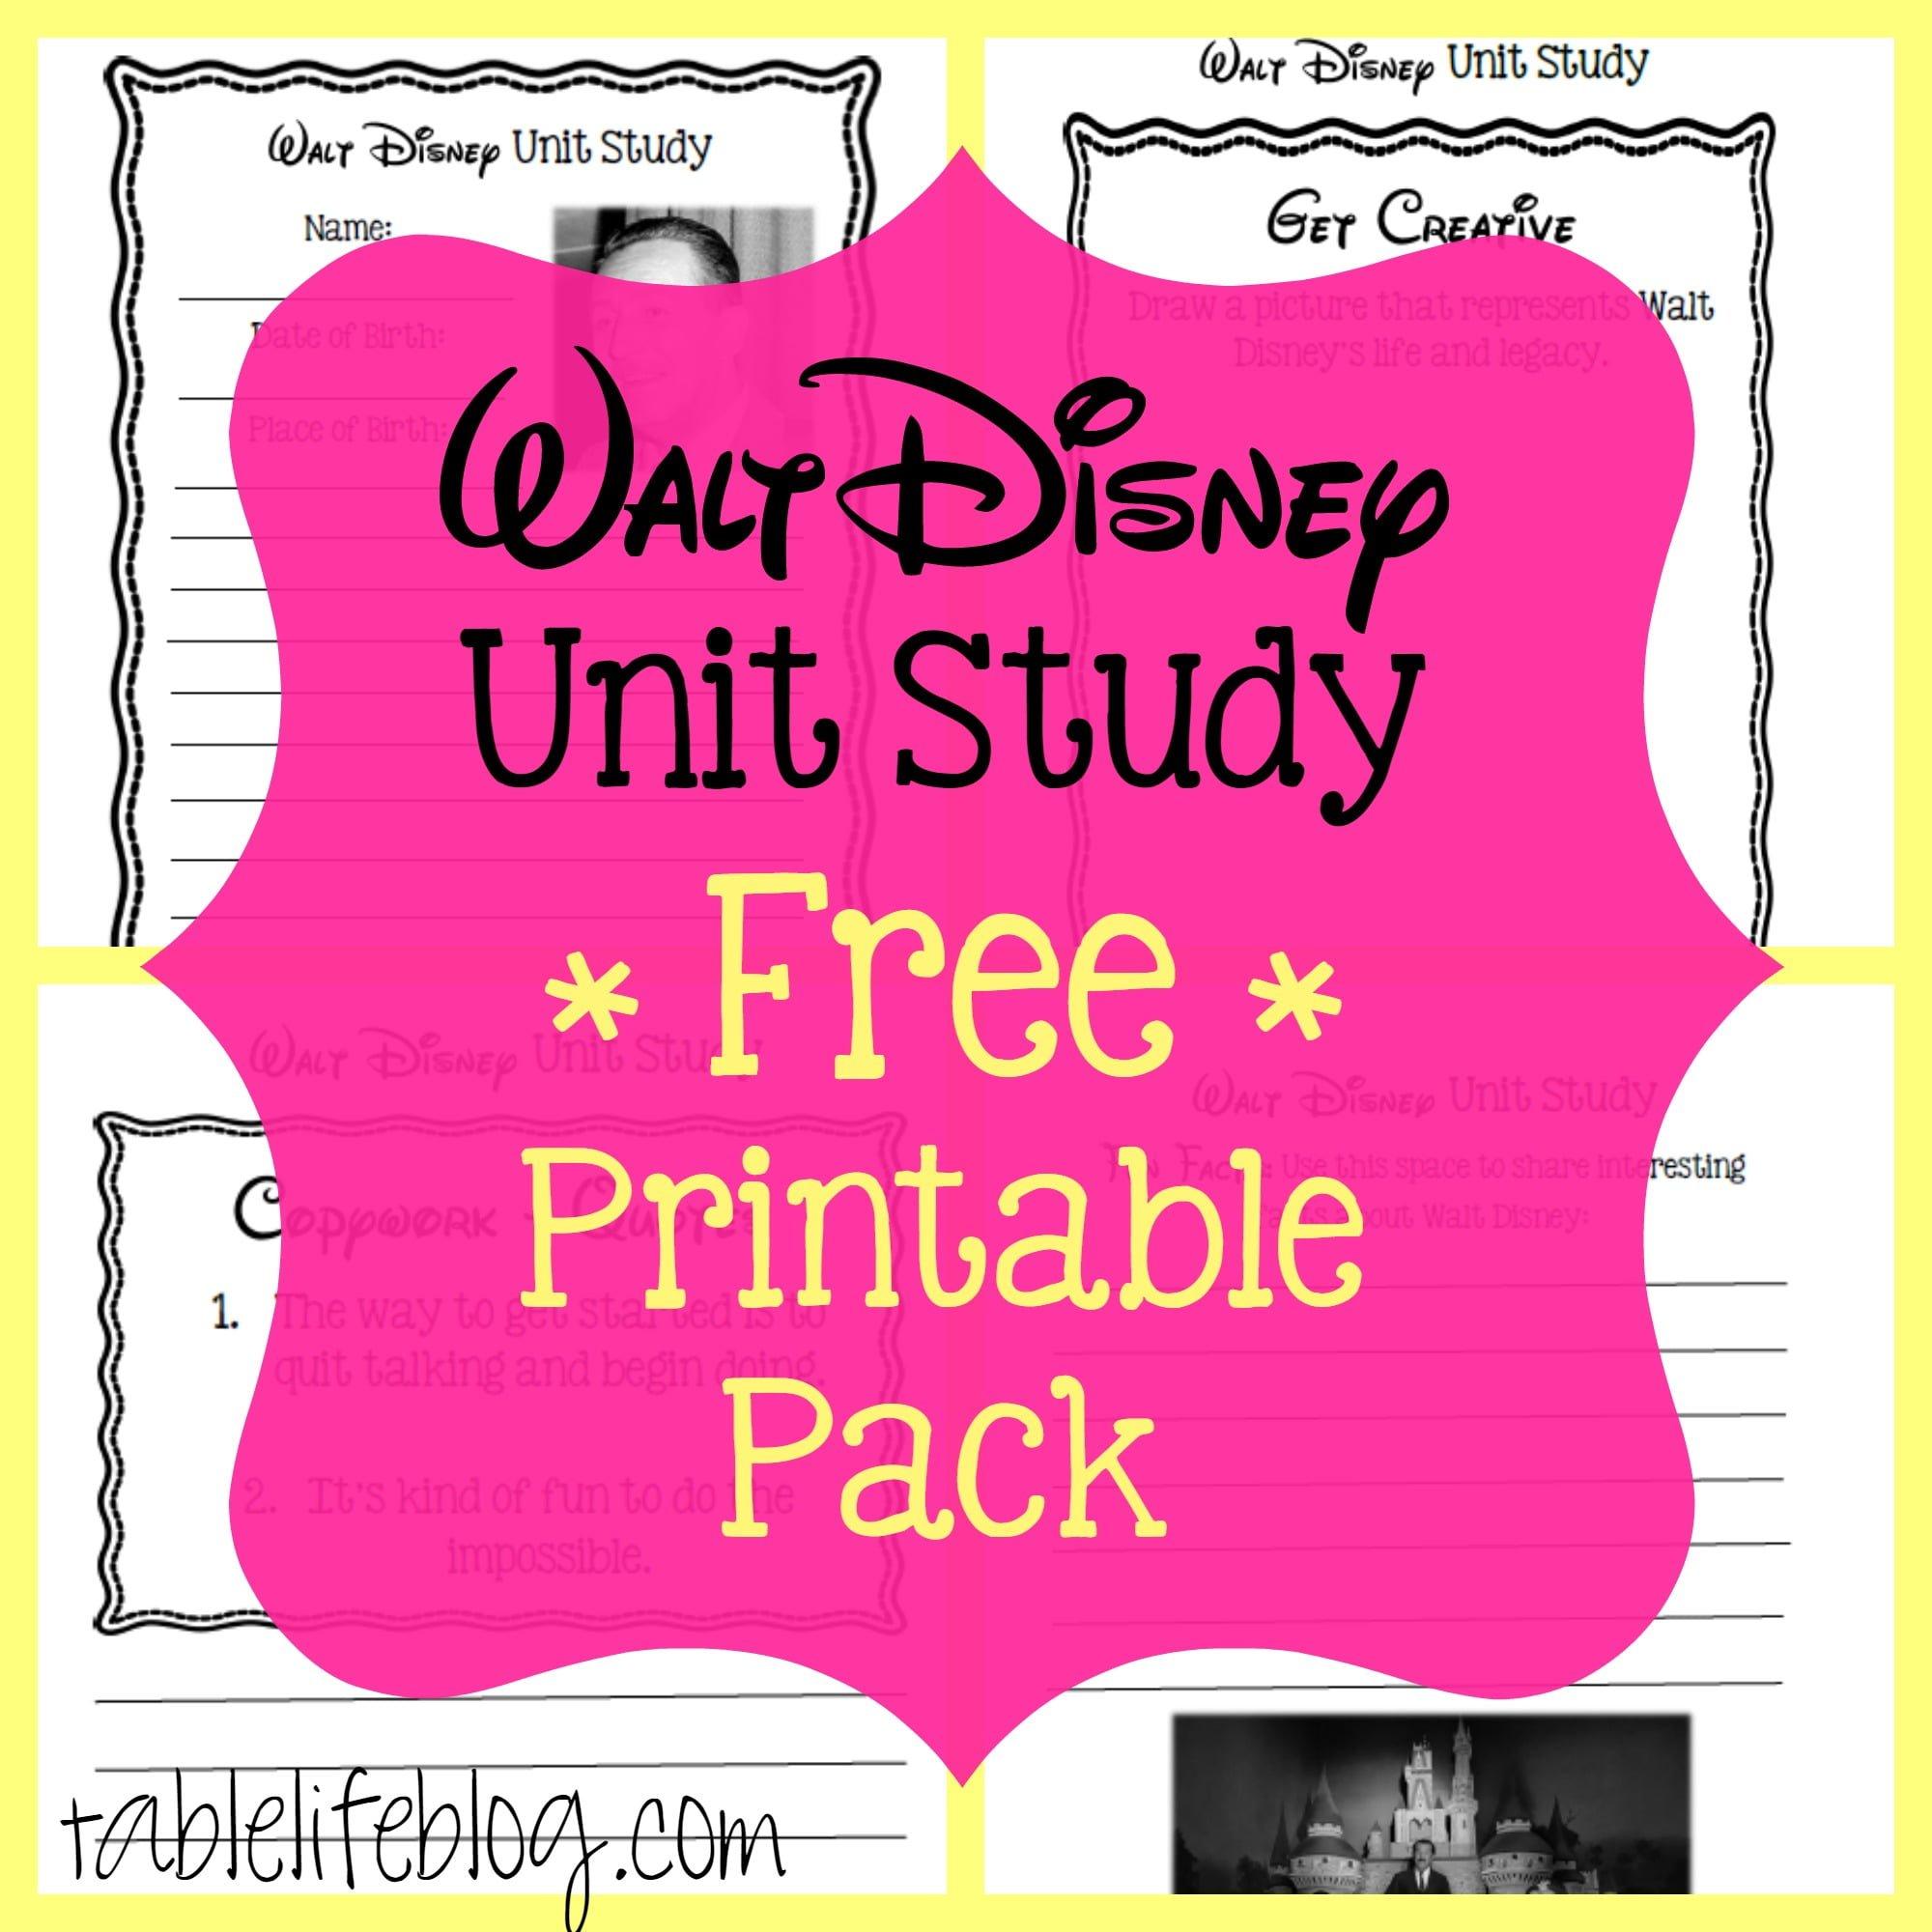 Walt Disney Unit Study With Free Printable